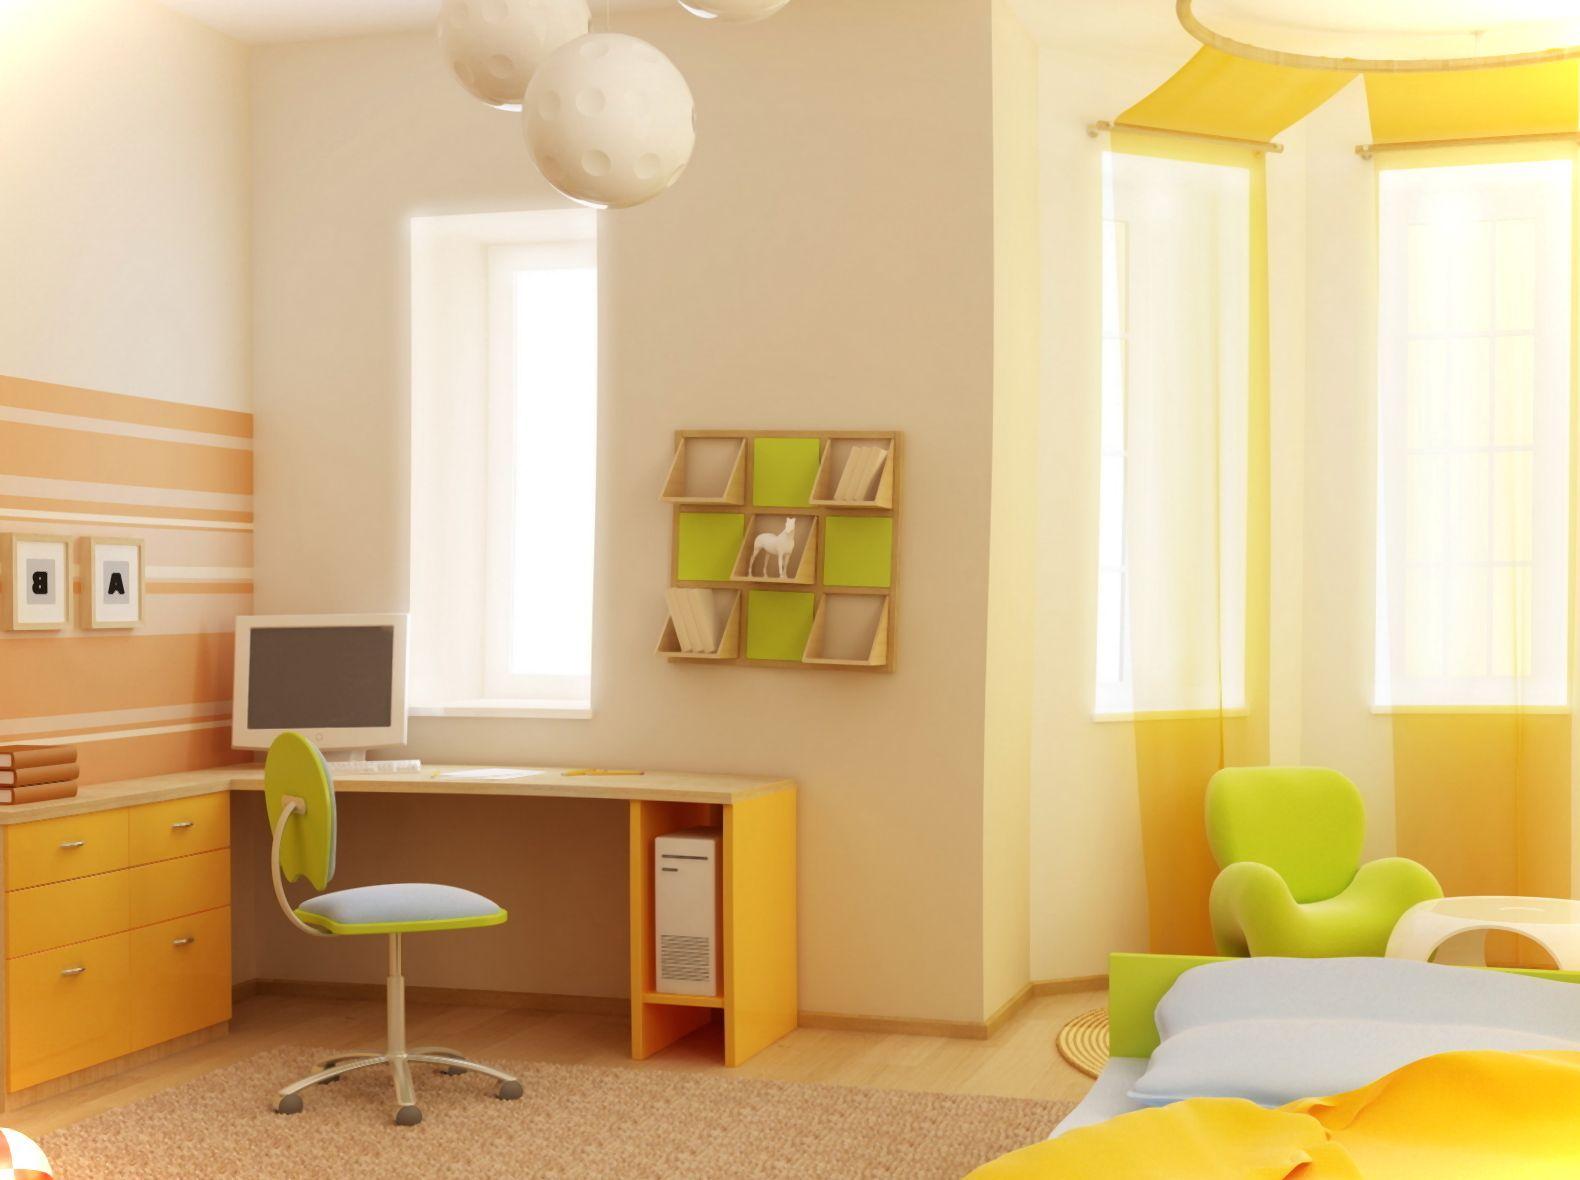 Bedroom Desk Chair - Shia-Labeouf.Biz | Cygnet Boat Project ...